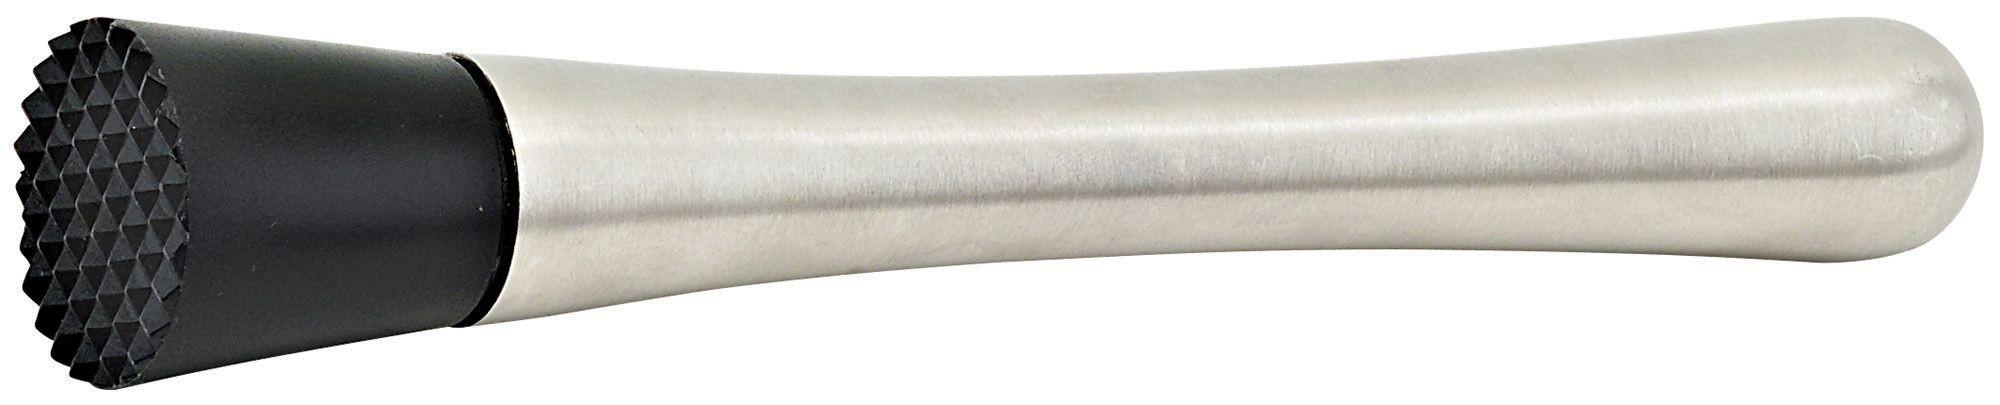 Winco SBM-8N Netted Head Stainless Steel Muddler